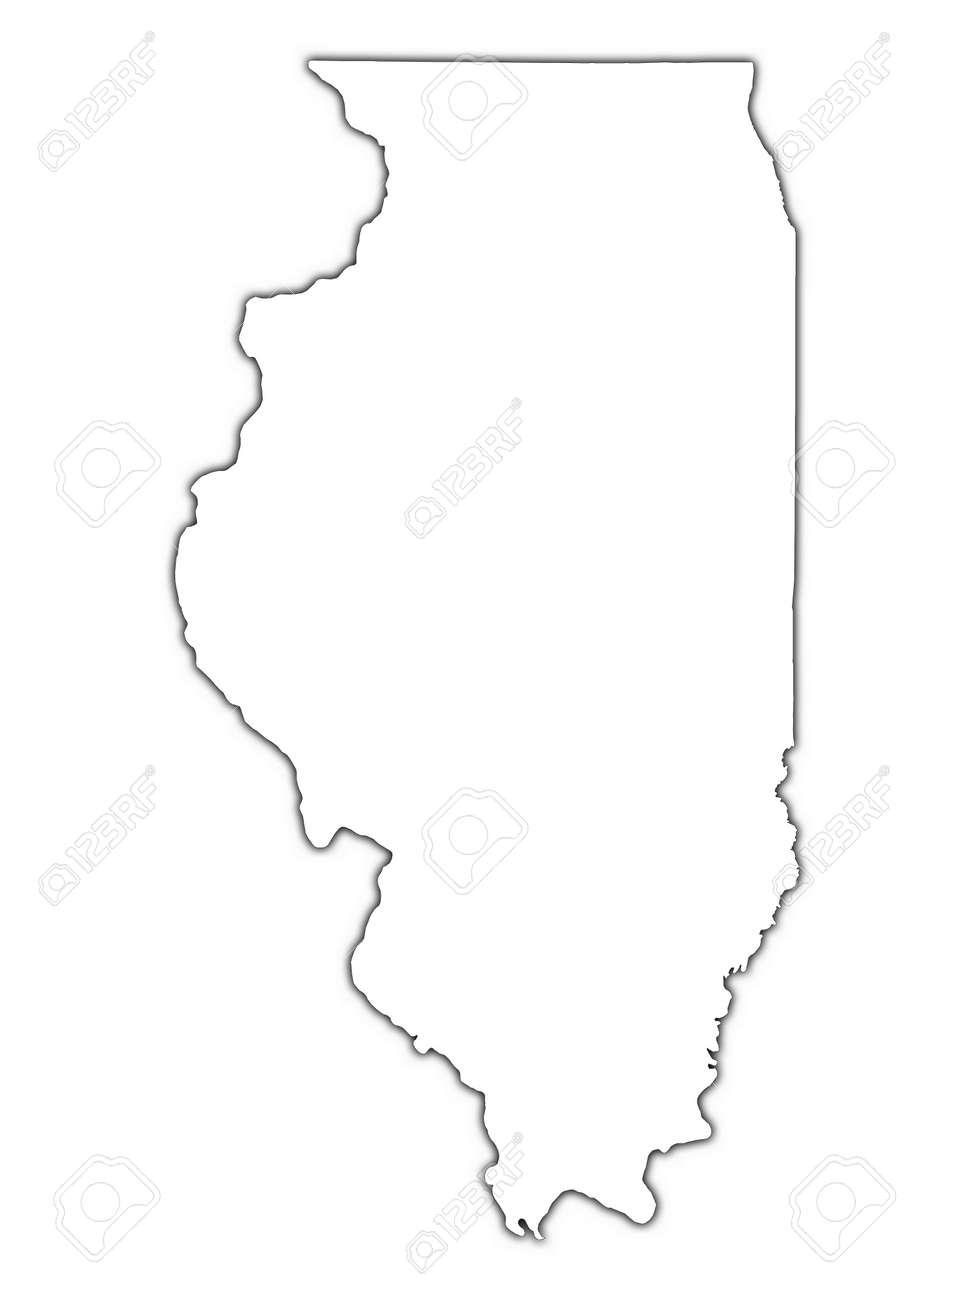 United States Of America USA Free Maps Free Blank Maps Free US - Usa outline